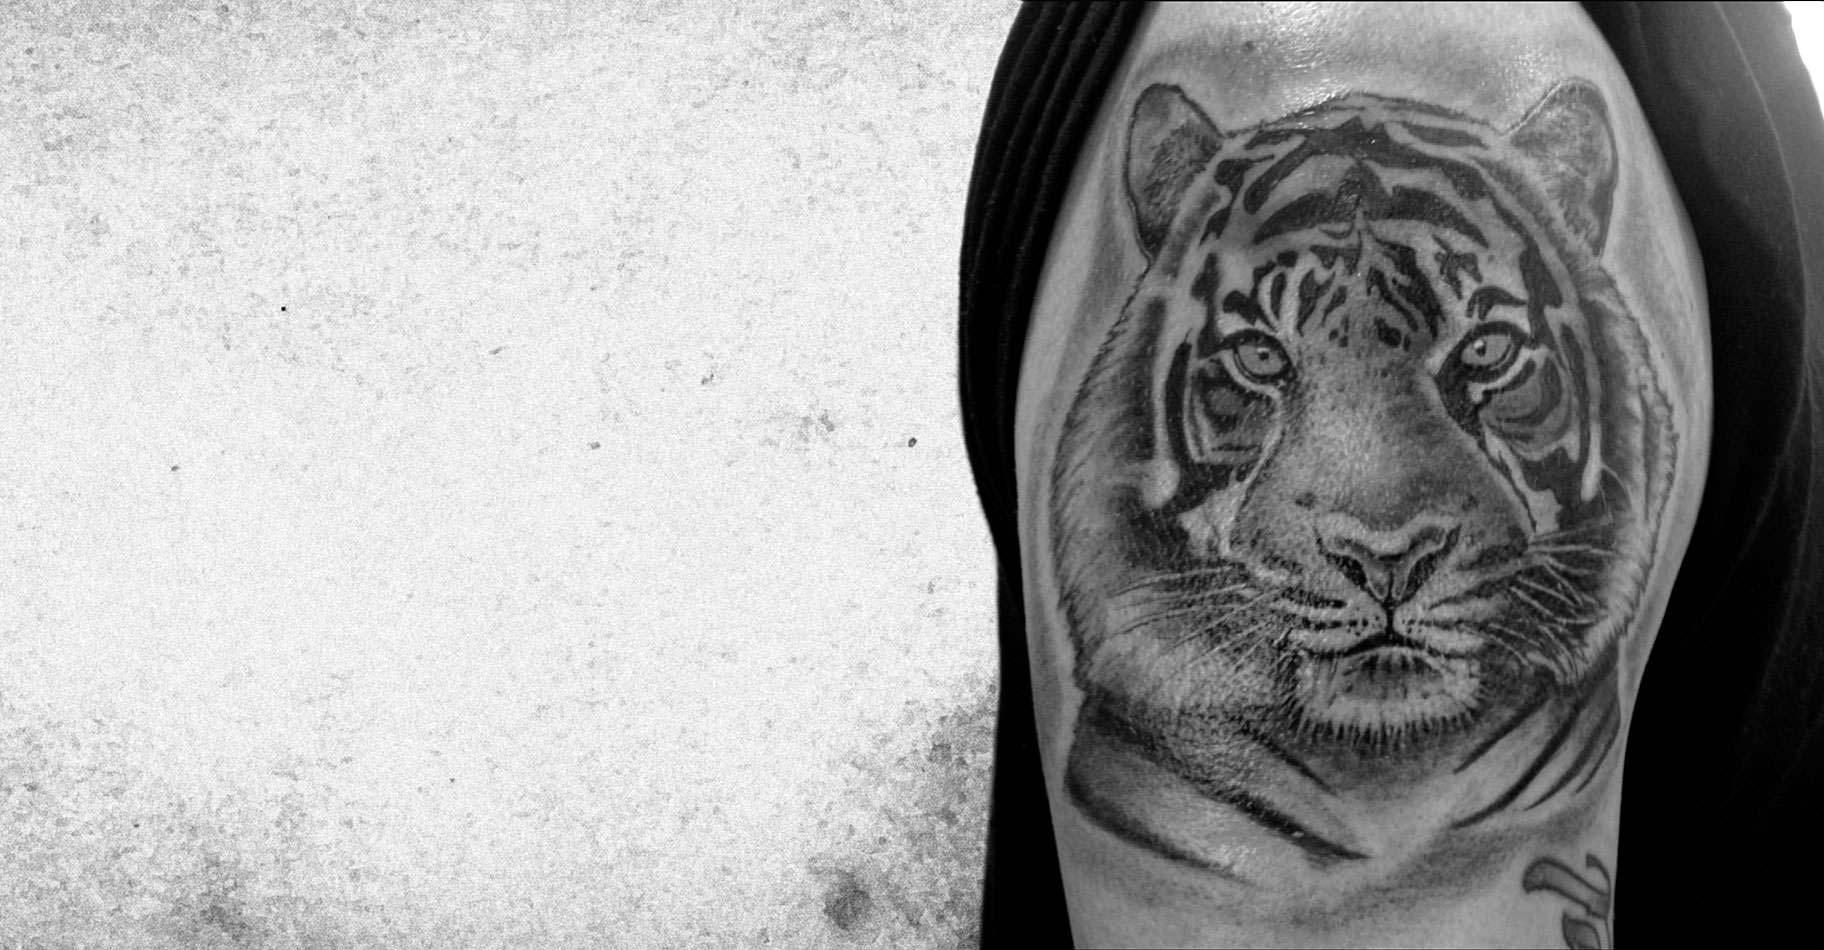 Miss Tattoo Ink | Tatuajes · Piercings · Eliminación de tatuajes con láser